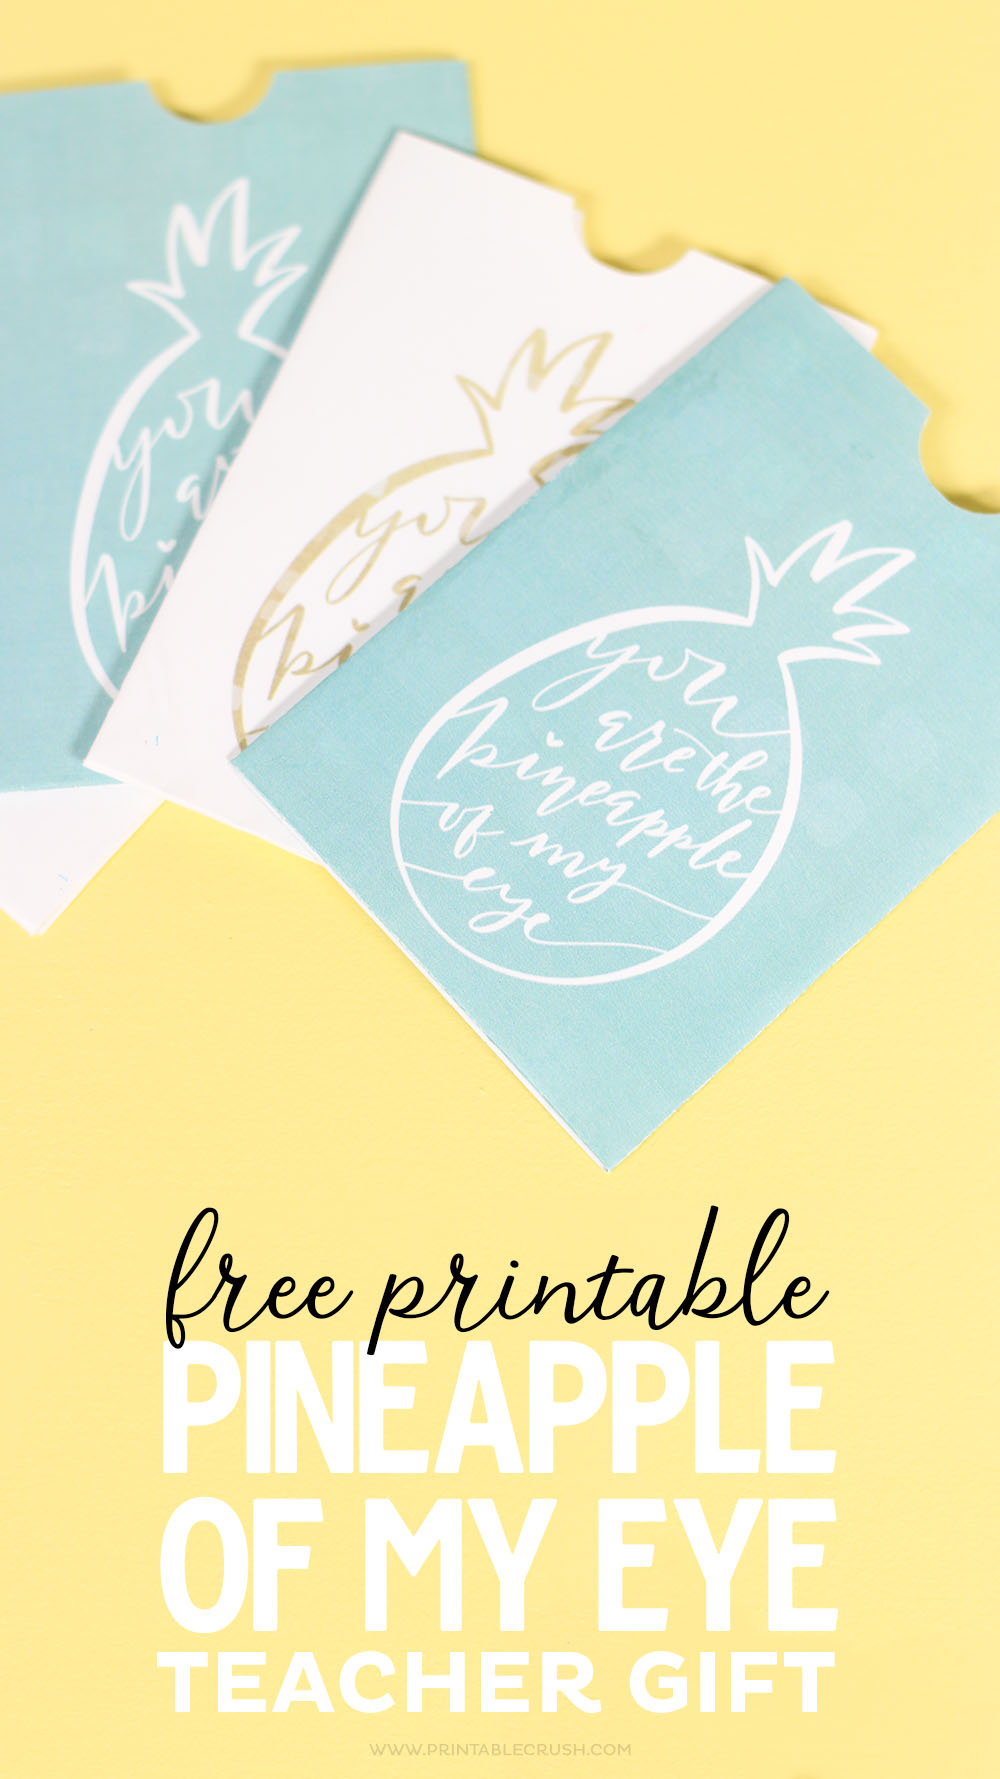 Free printable Pineapple of my Eye Teacher Gift Card Holders for teacher appreciation week!